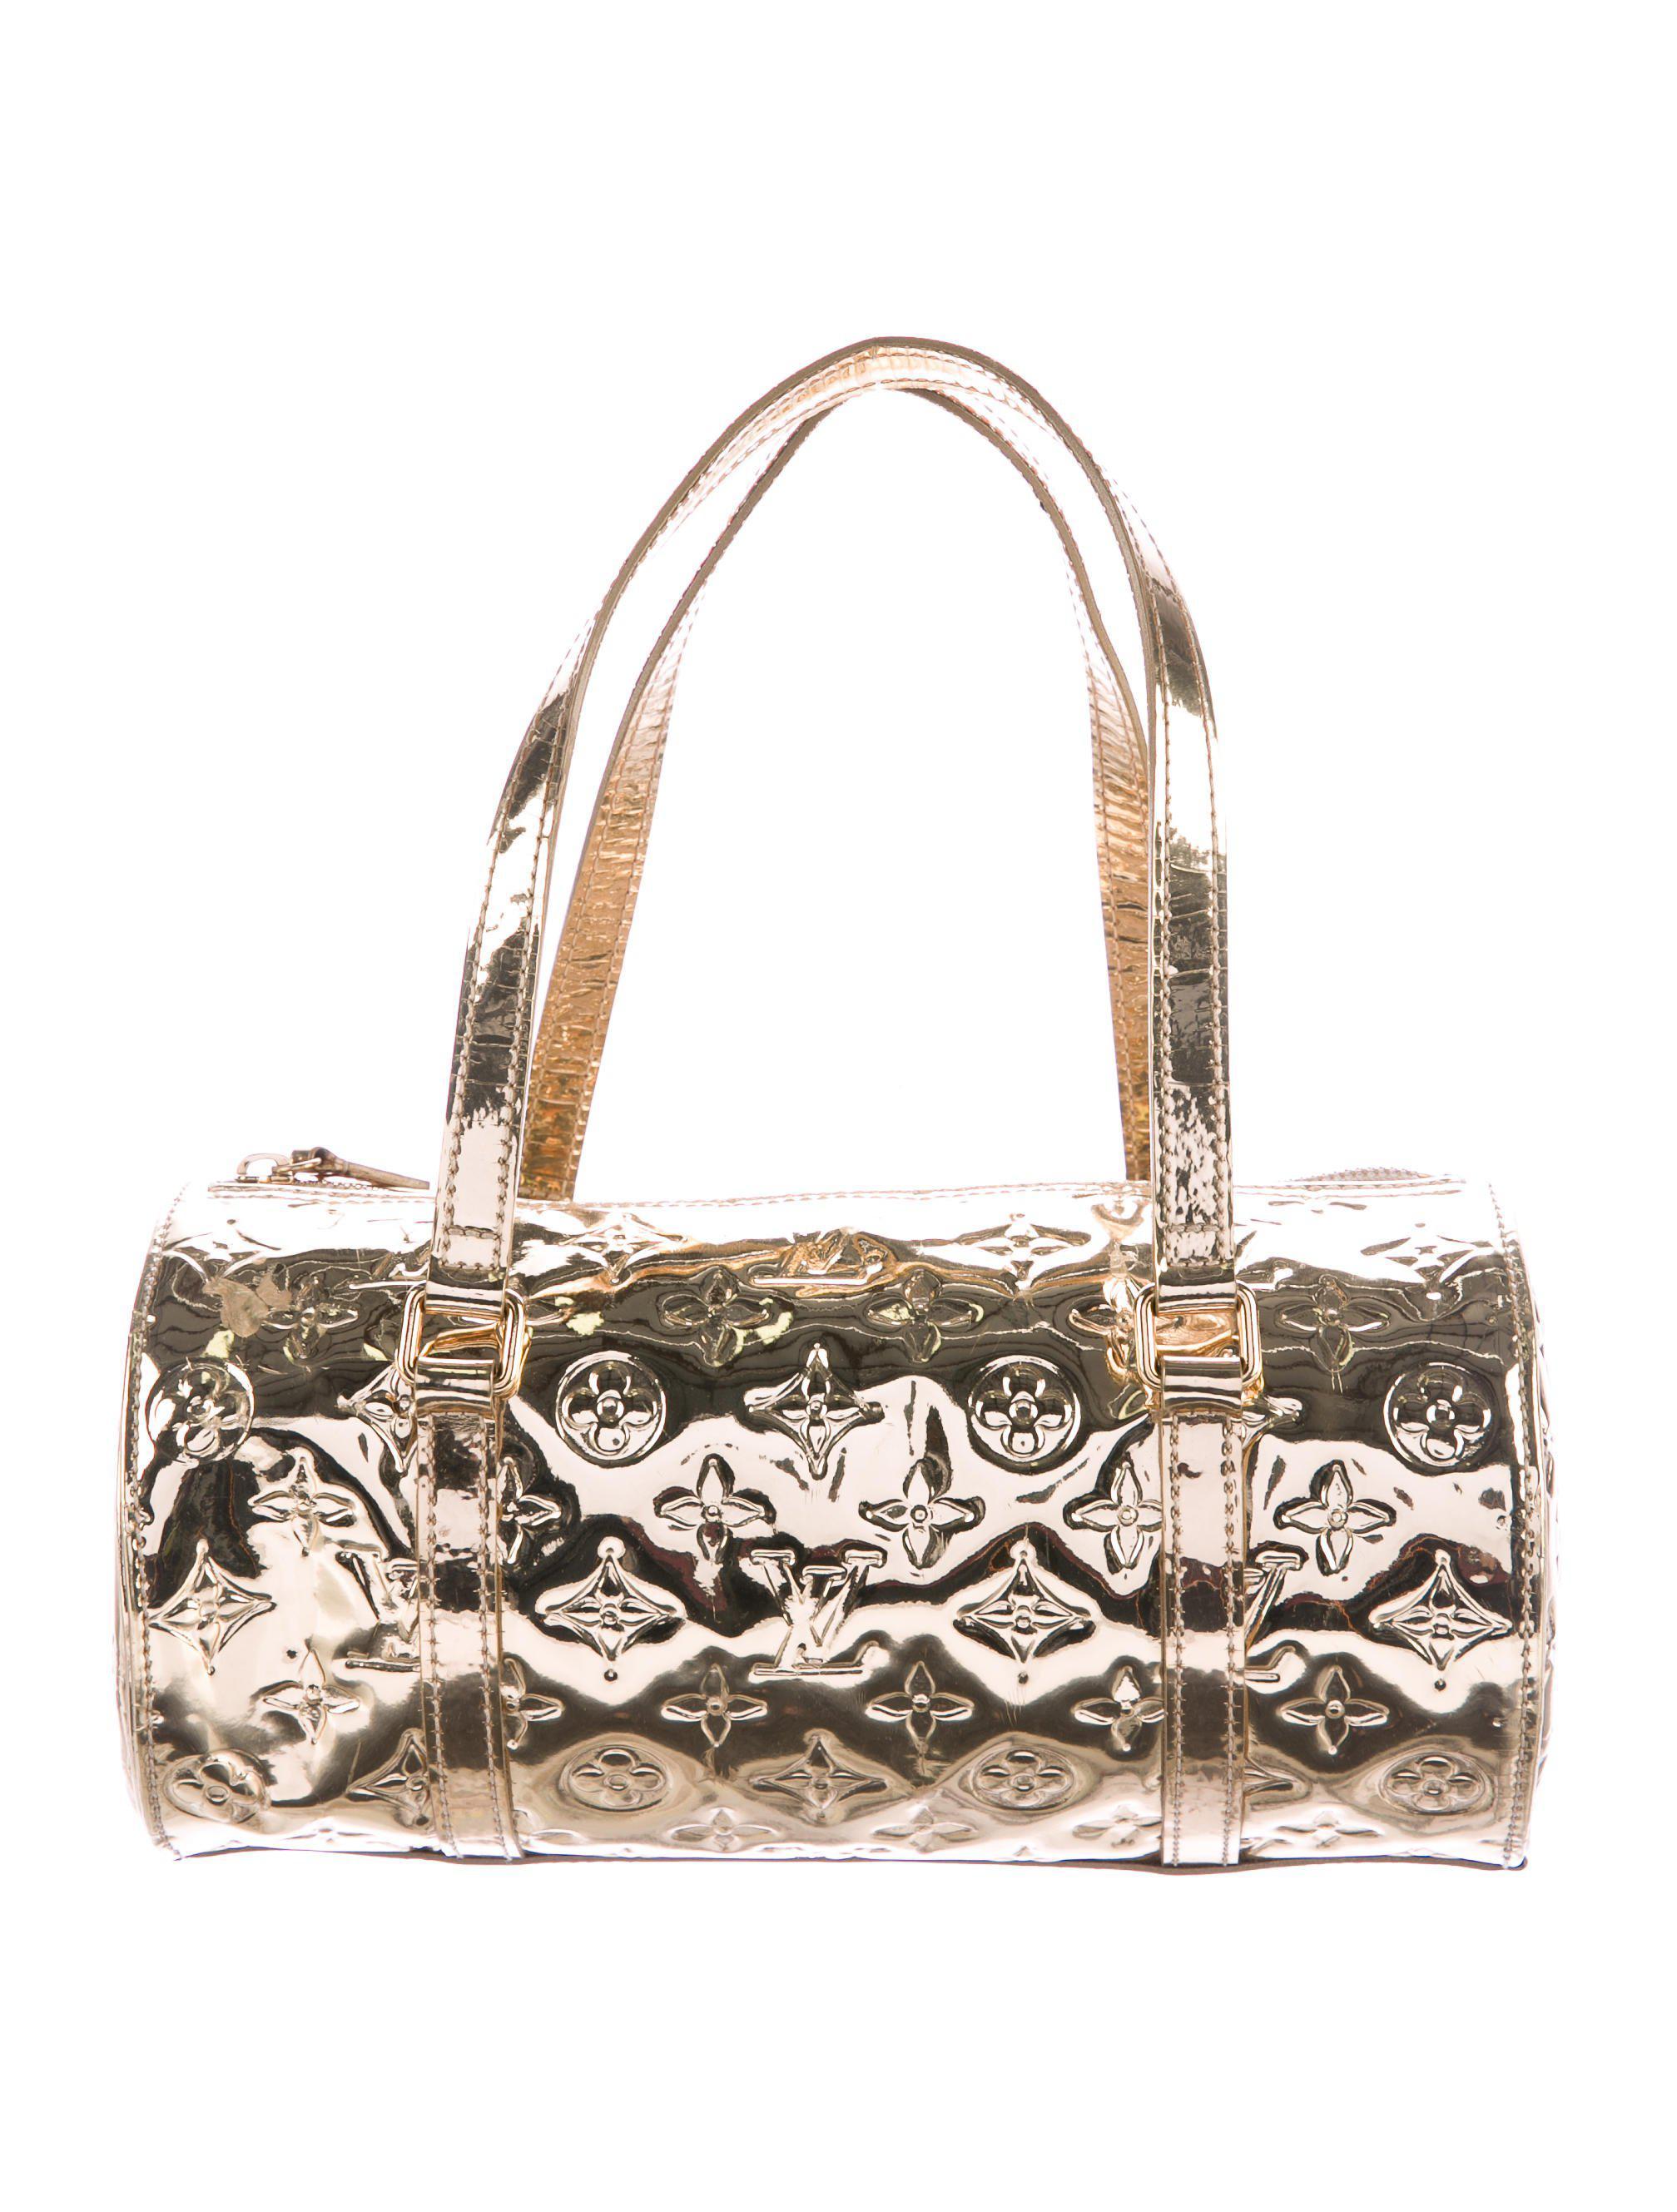 bdacbf0142 Lyst - Louis Vuitton Mirror Miroir Papillon Bag in Metallic